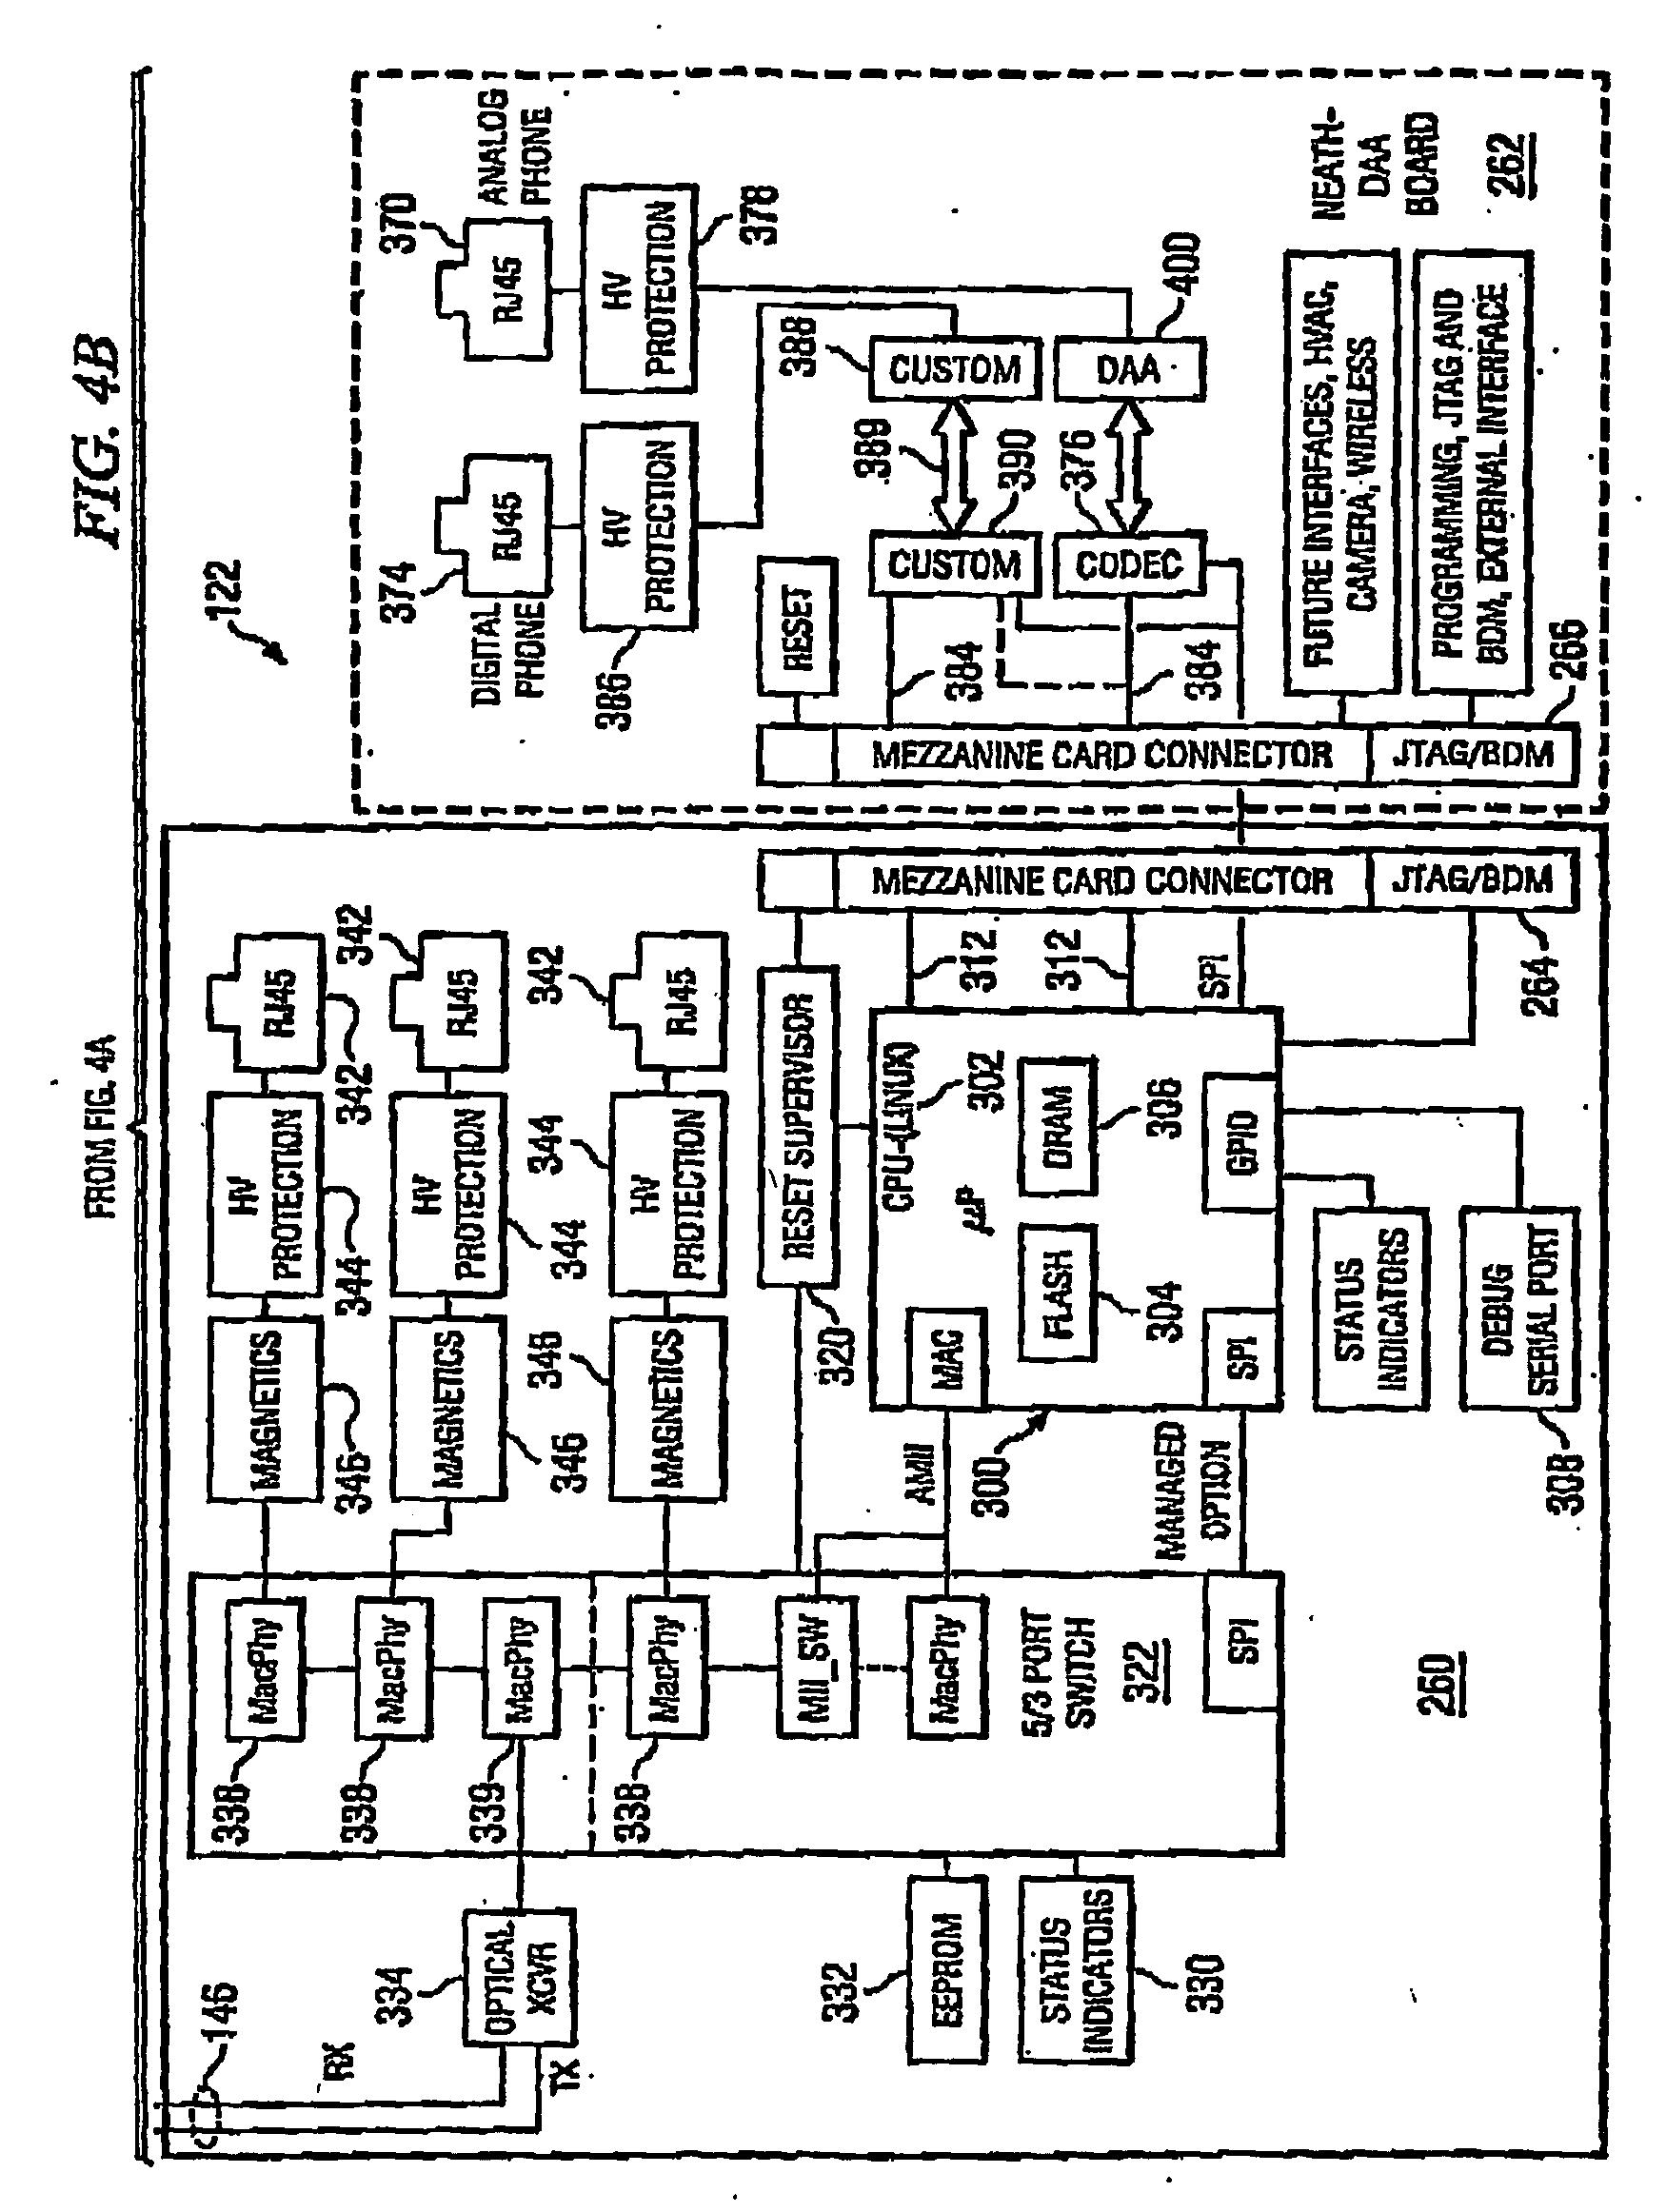 Wall socket wiring diagram clipsal rj45 wall plate wiring diagram the best wiring diagram 2017 cheapraybanclubmaster Gallery